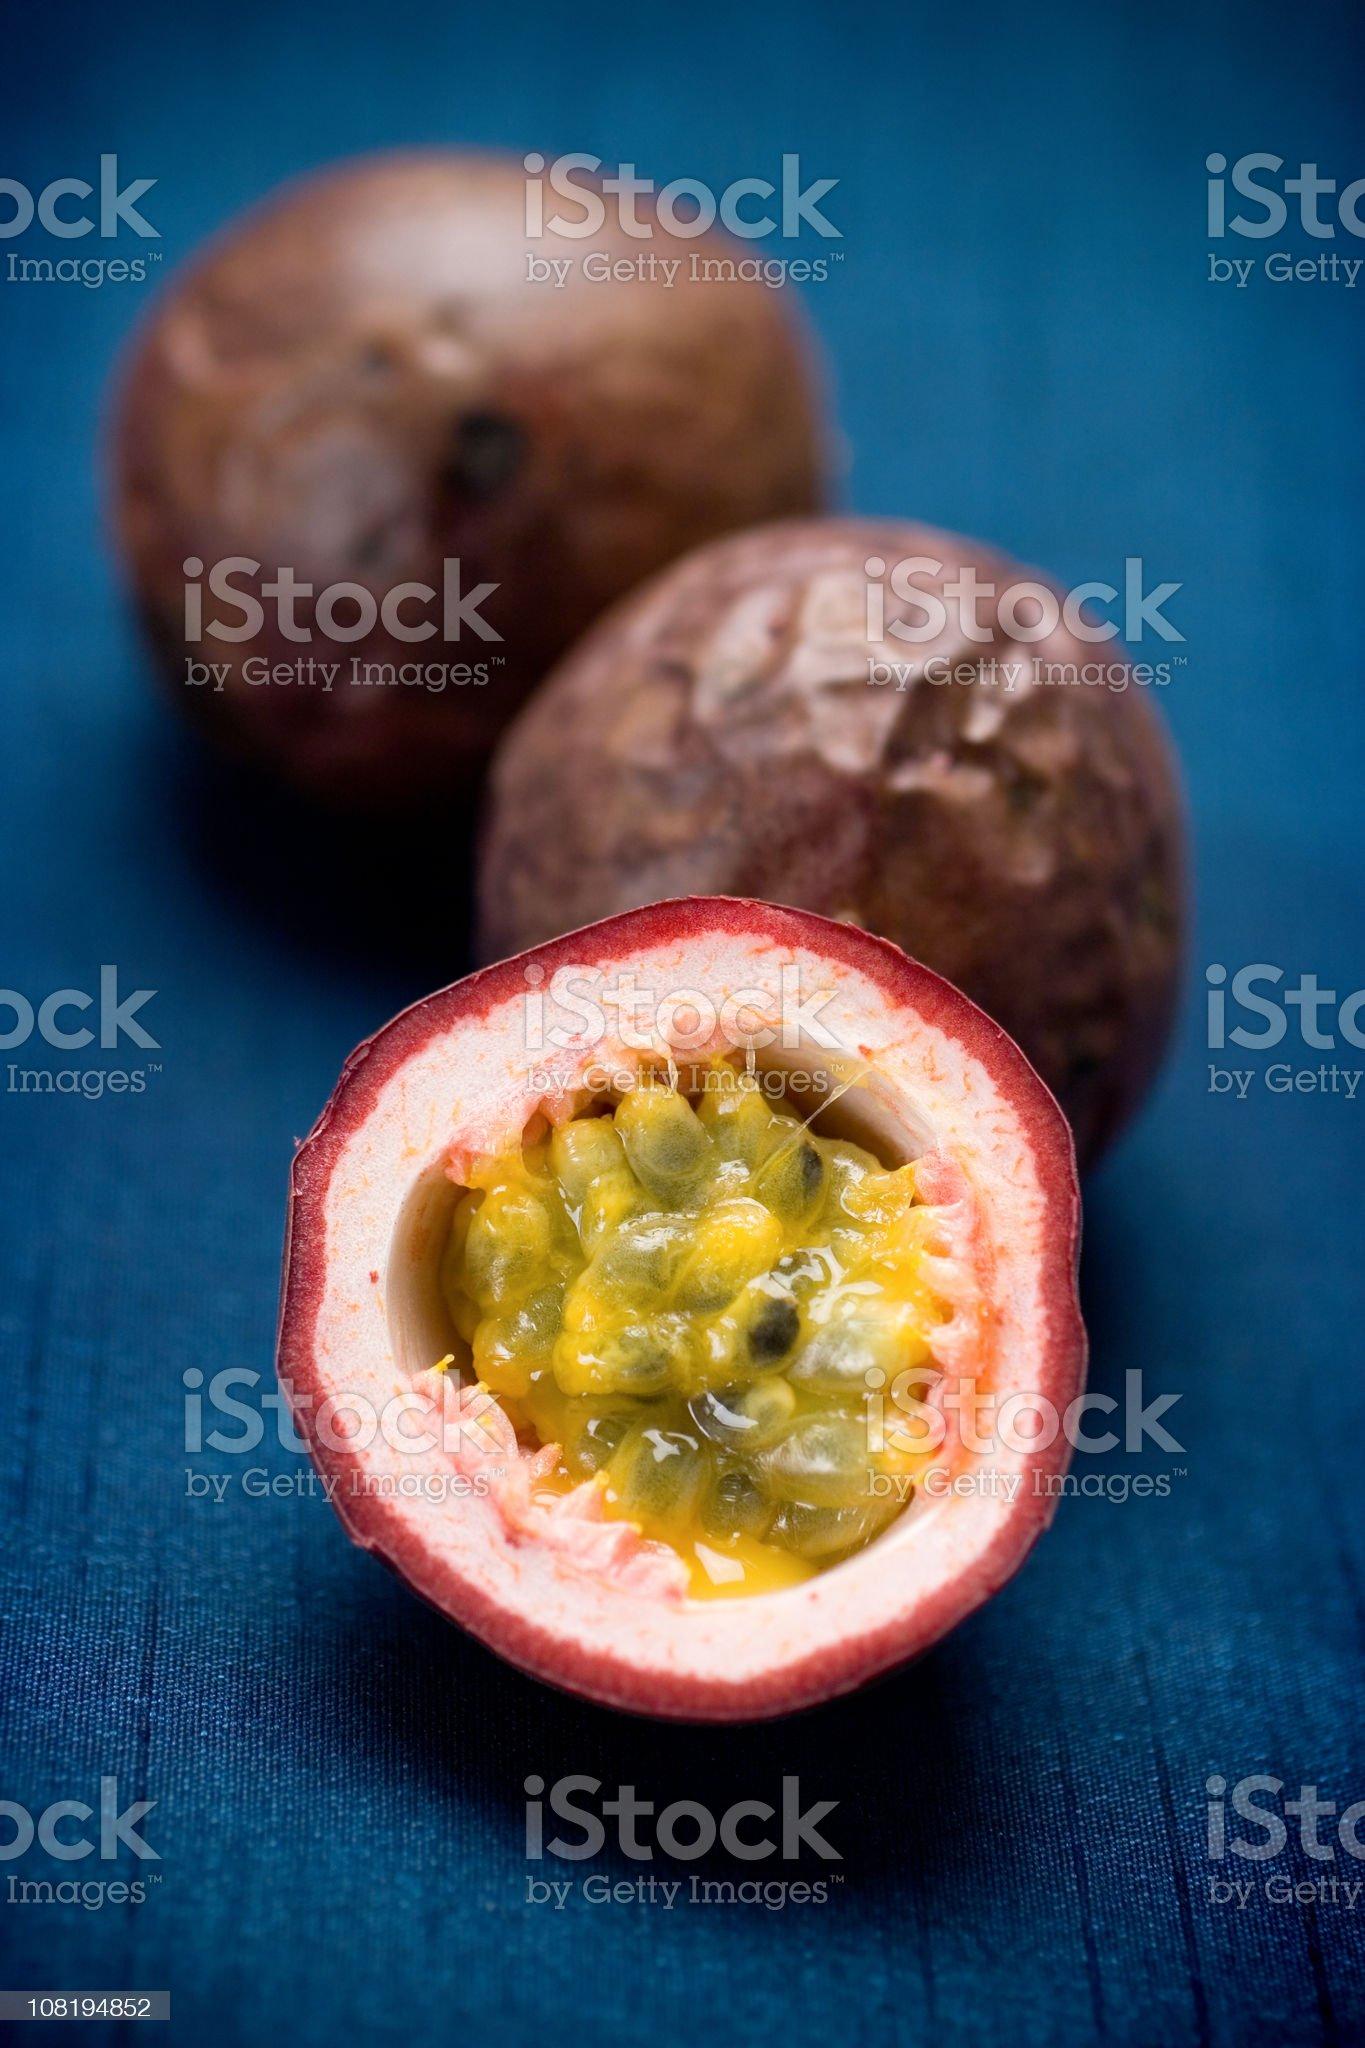 Passion Fruit royalty-free stock photo